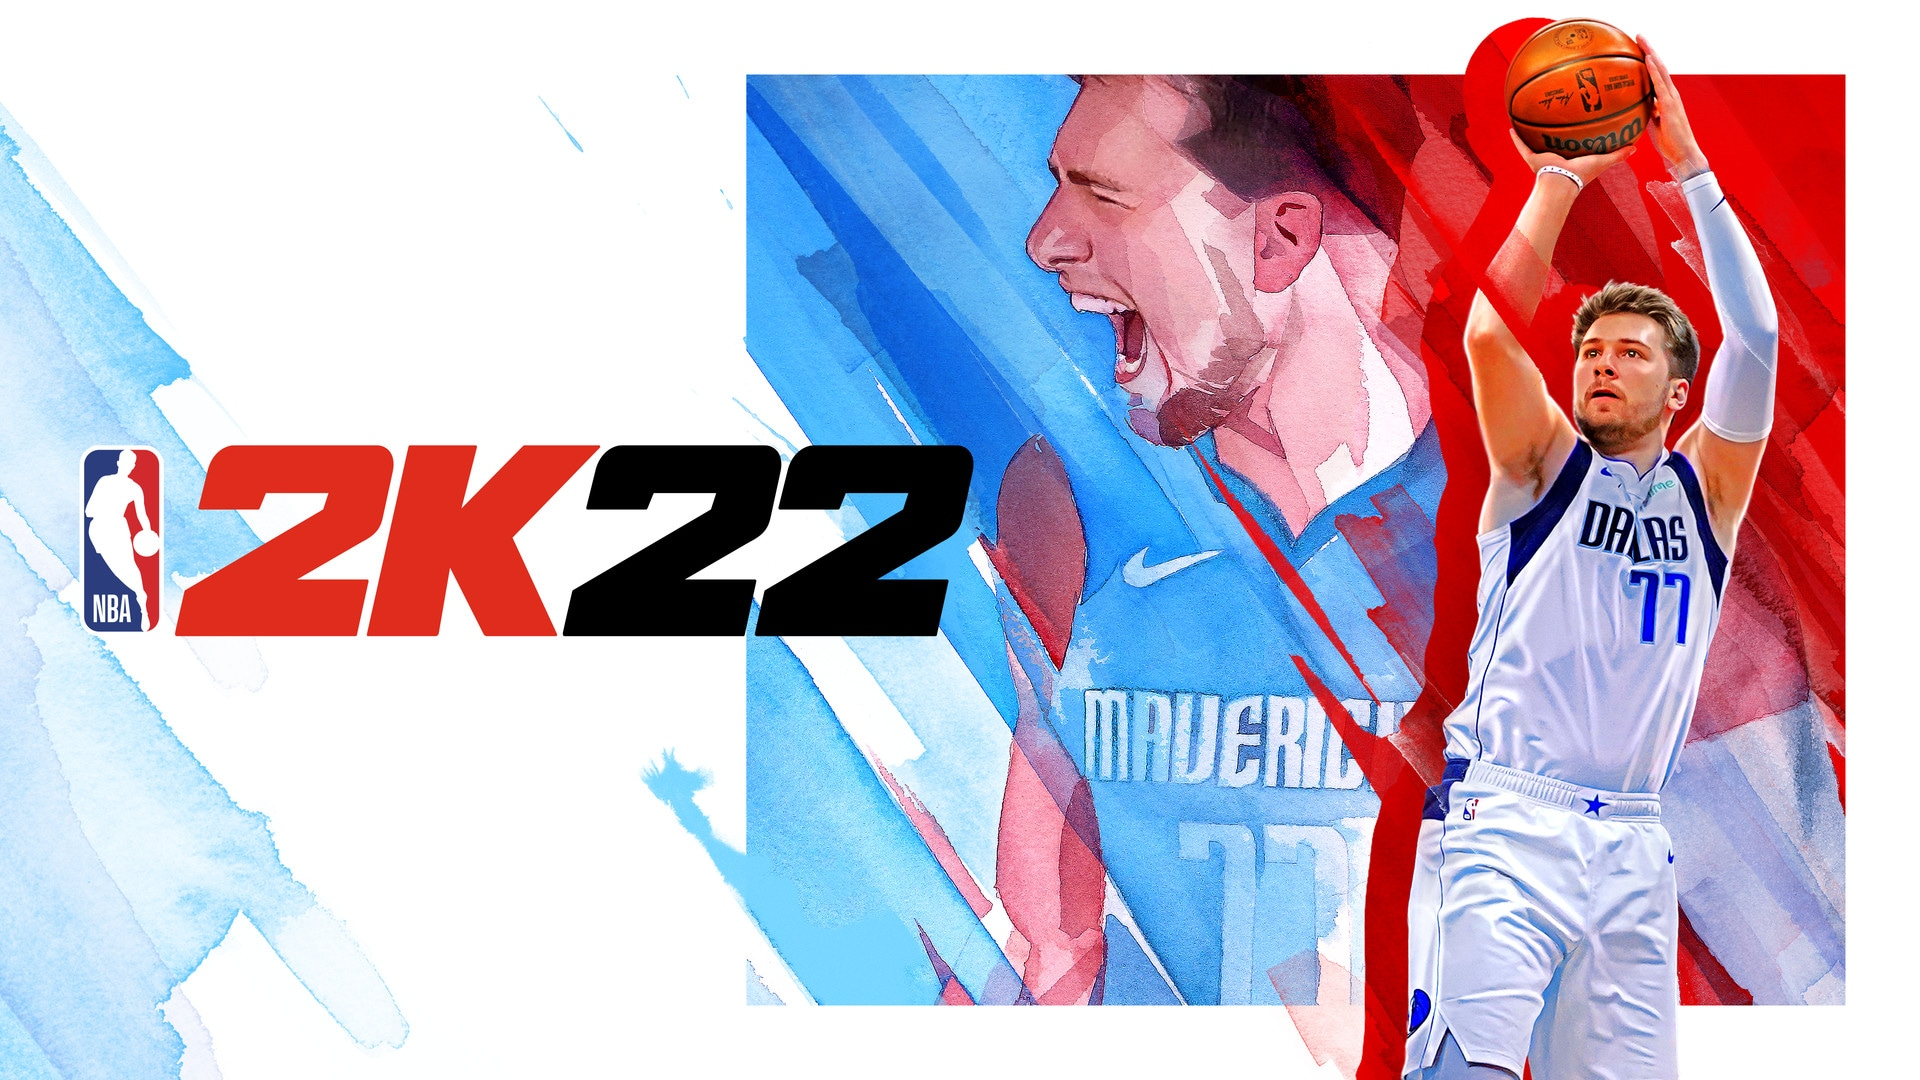 NBA 2K22 | 75th Anniversary Edition (Xbox Series X/S) - Xbox Live Key - UNITED STATES - 2